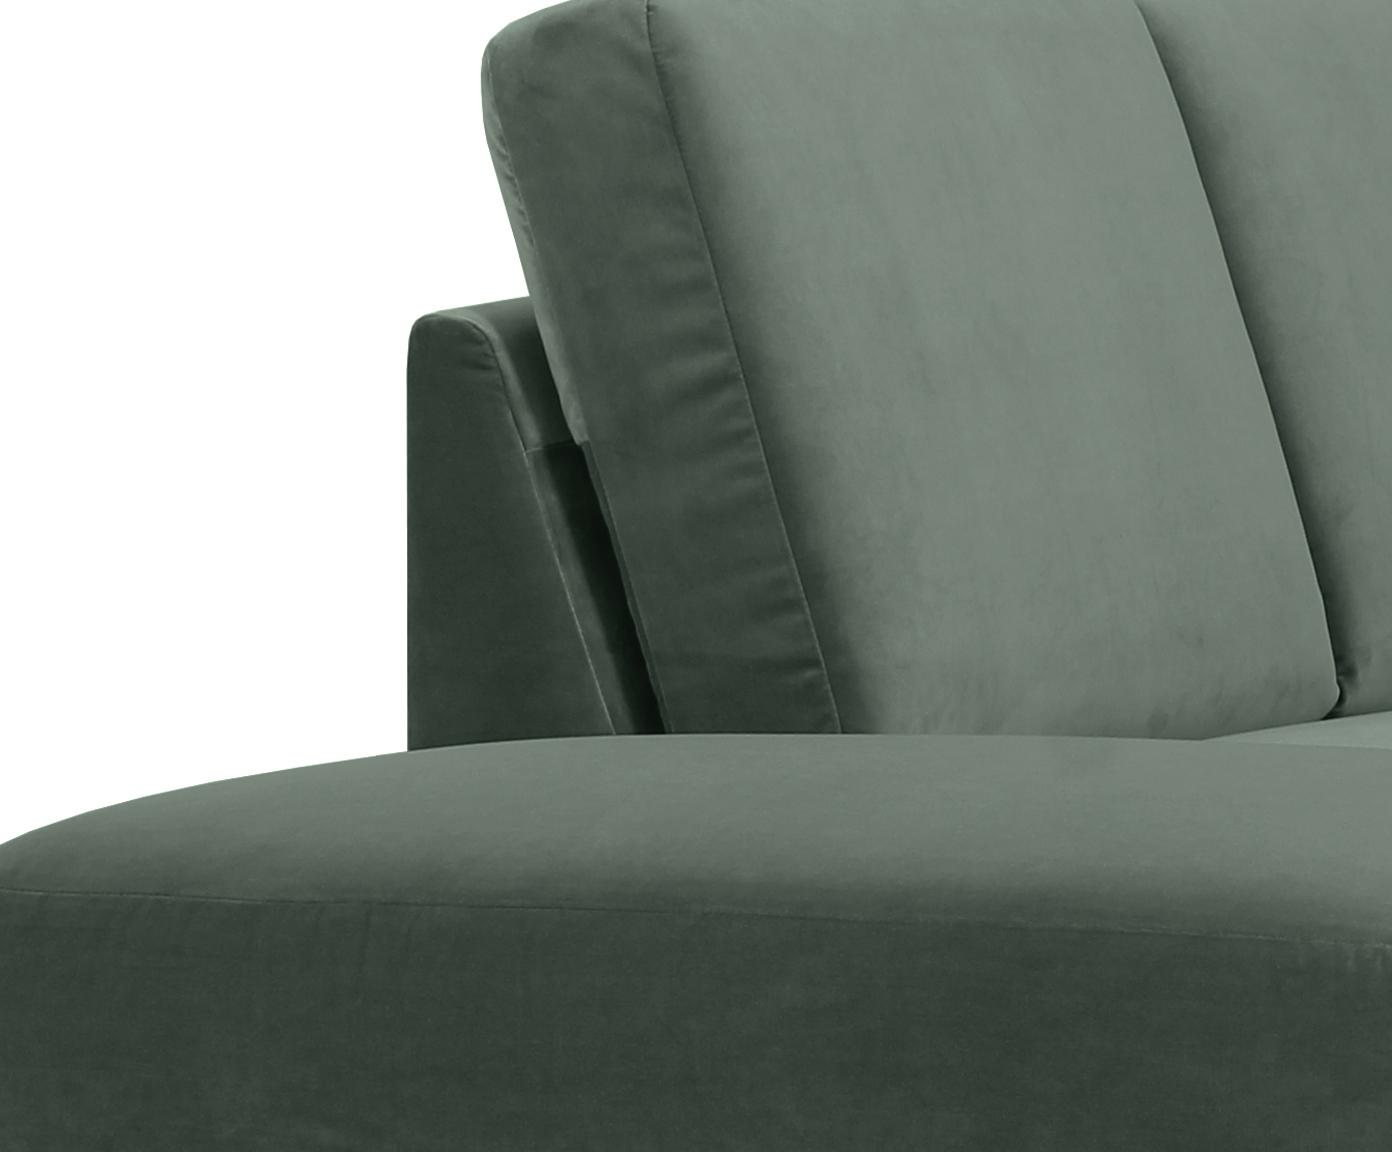 Samt-Ecksofa Fluente, Bezug: Samt (Hochwertiger Polyes, Gestell: Massives Kiefernholz, Füße: Metall, lackiert, Samt Grün, B 221 x T 200 cm